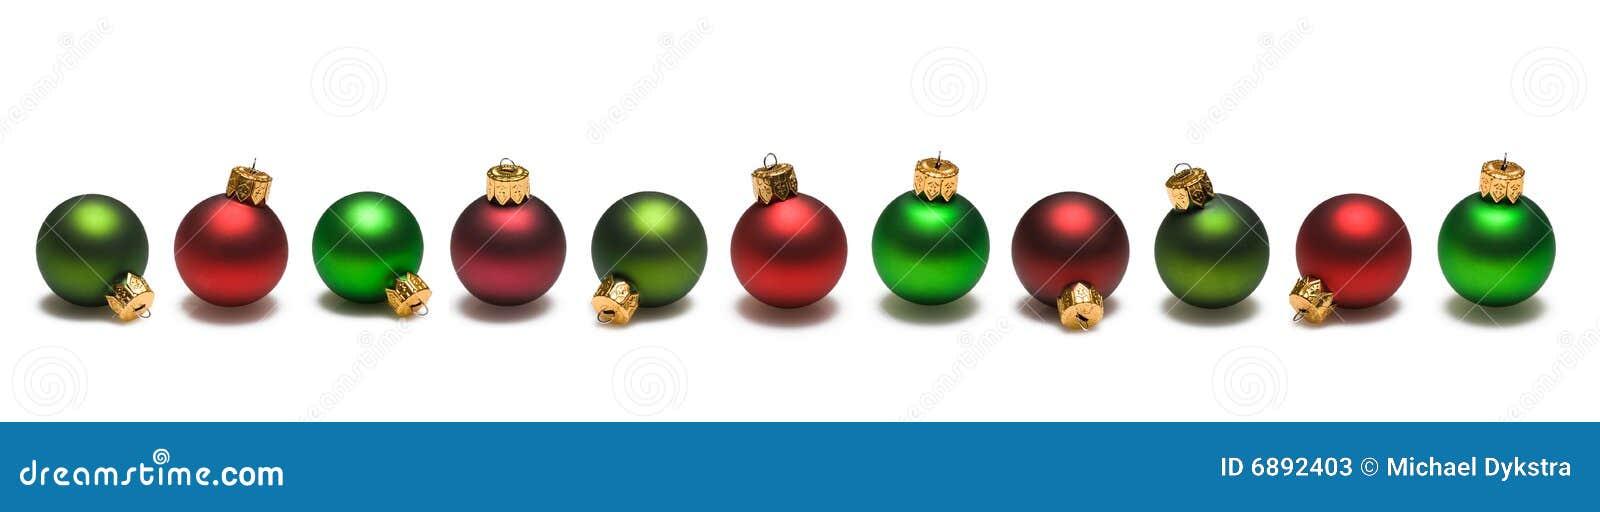 Christmas balls red green border stock image